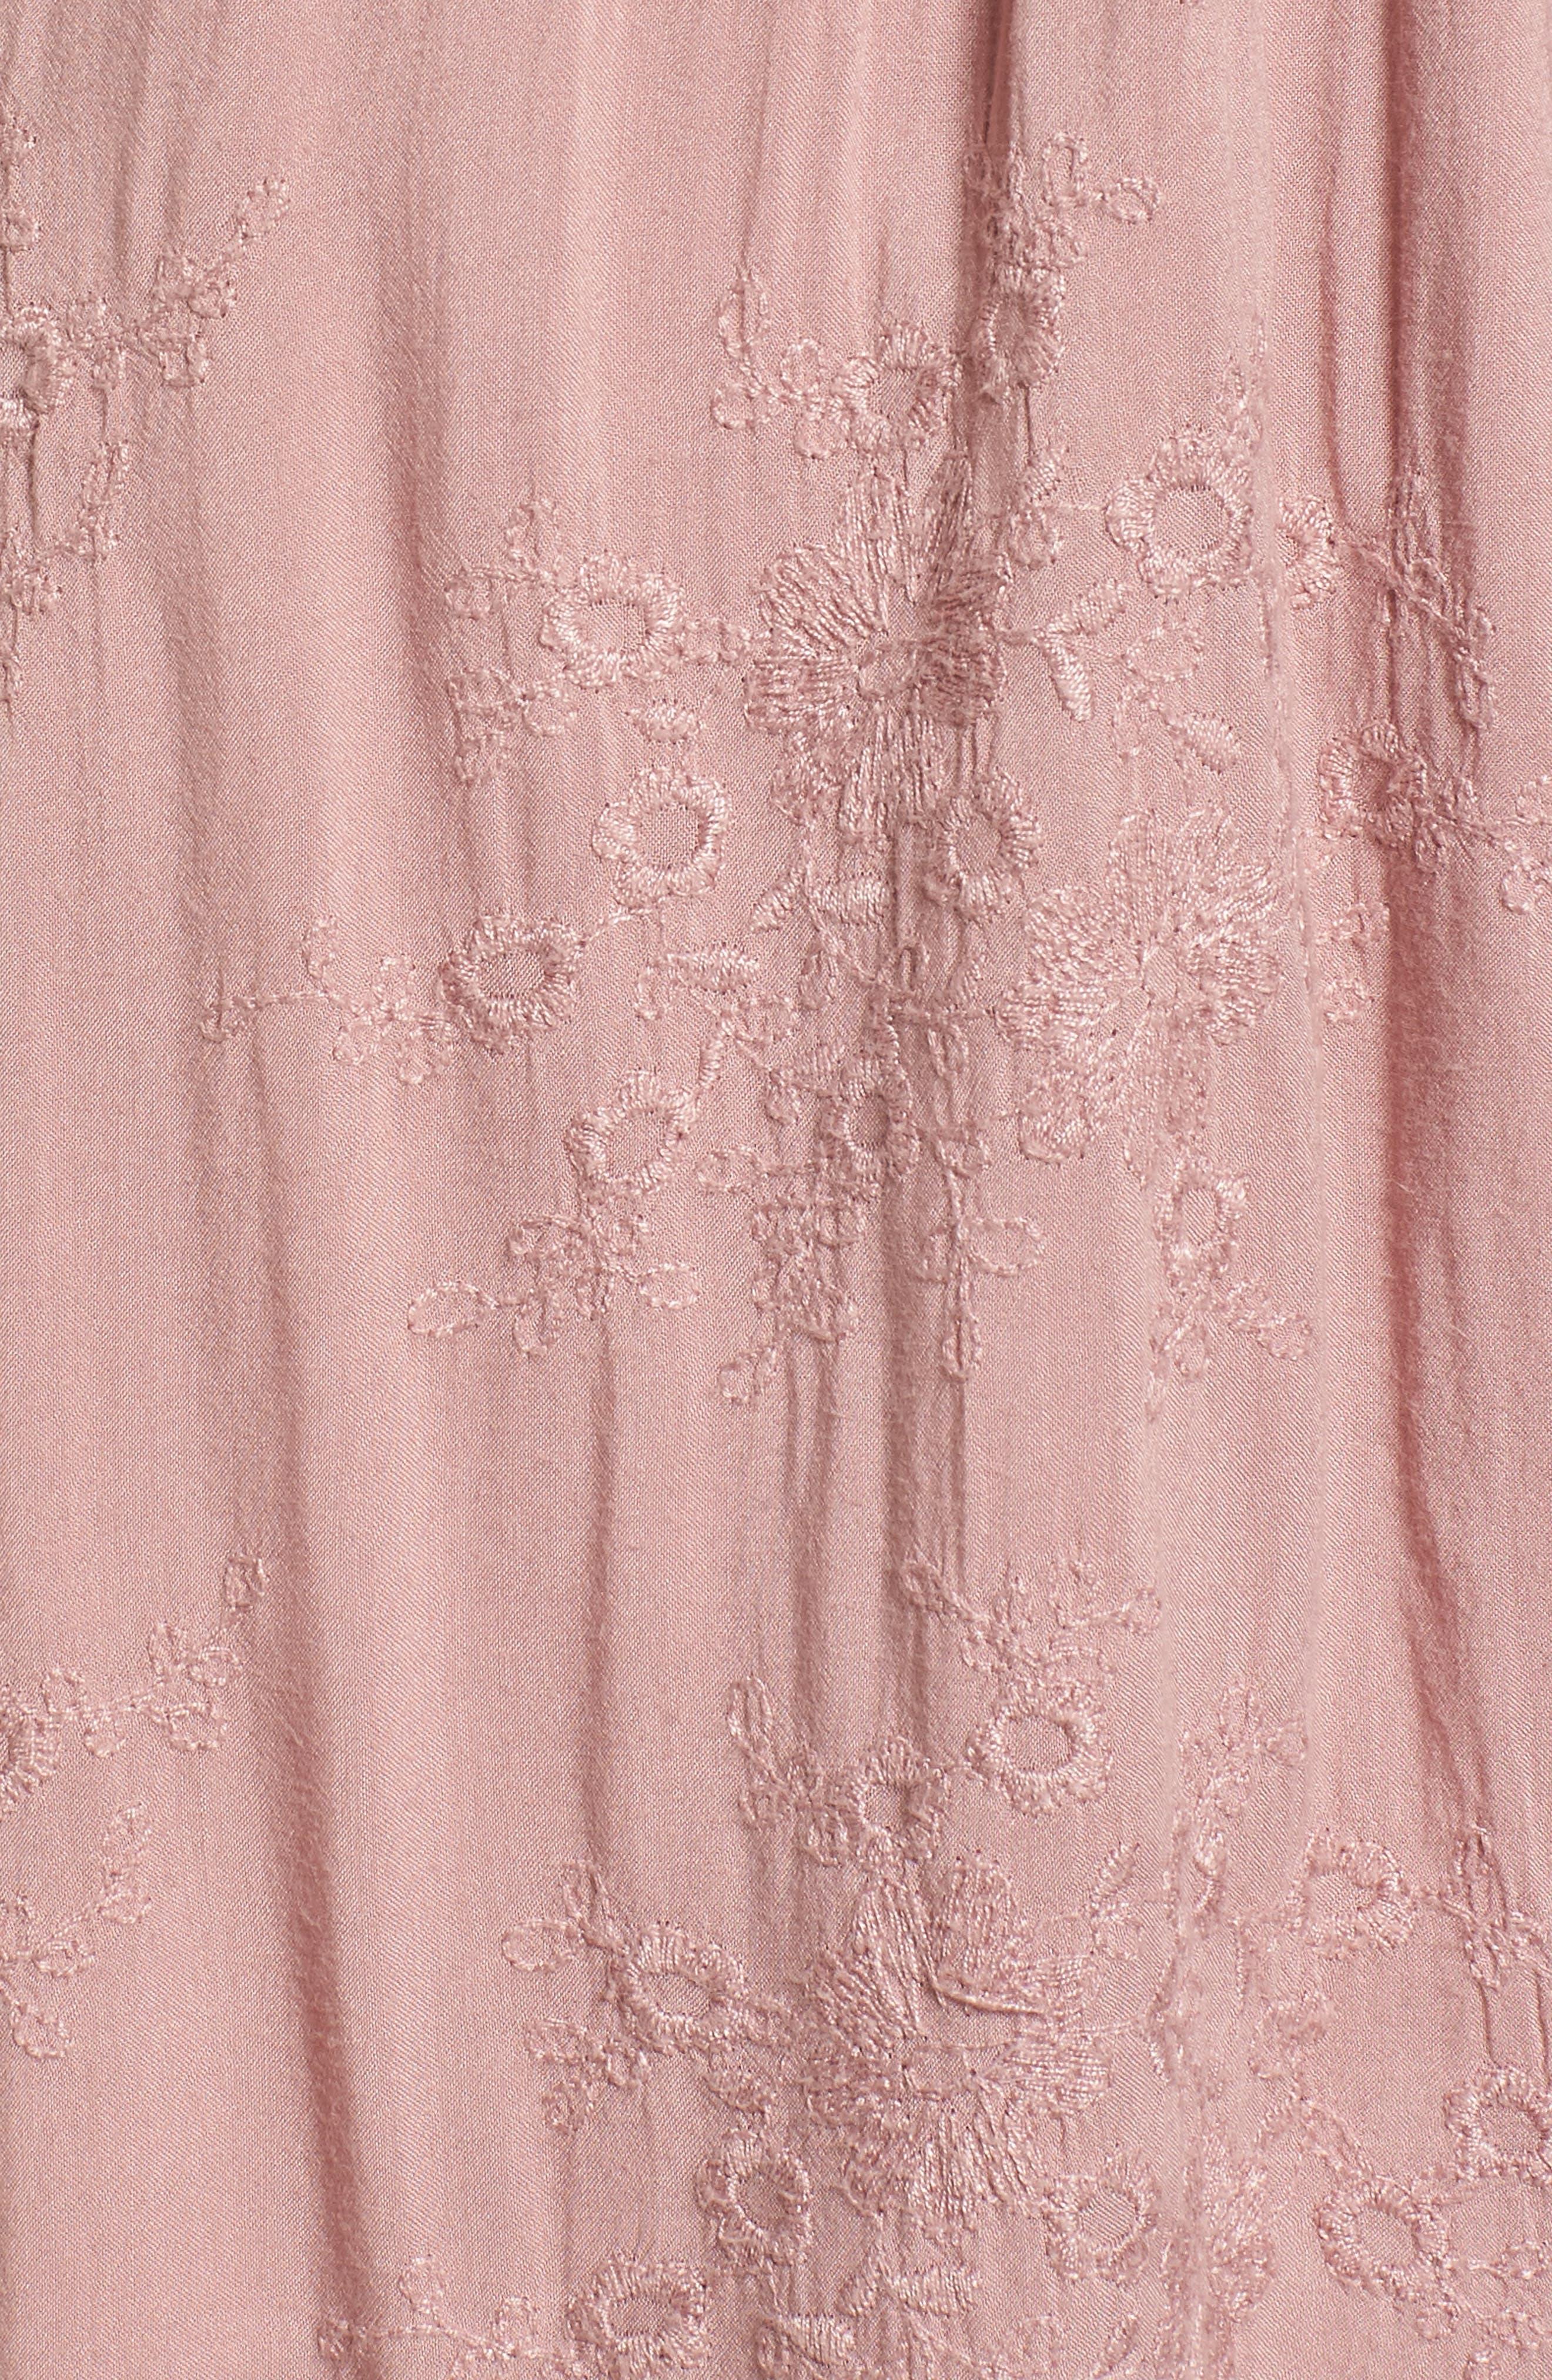 Rose Cold Shoulder High/Low Dress,                             Alternate thumbnail 6, color,                             Rosy Pink